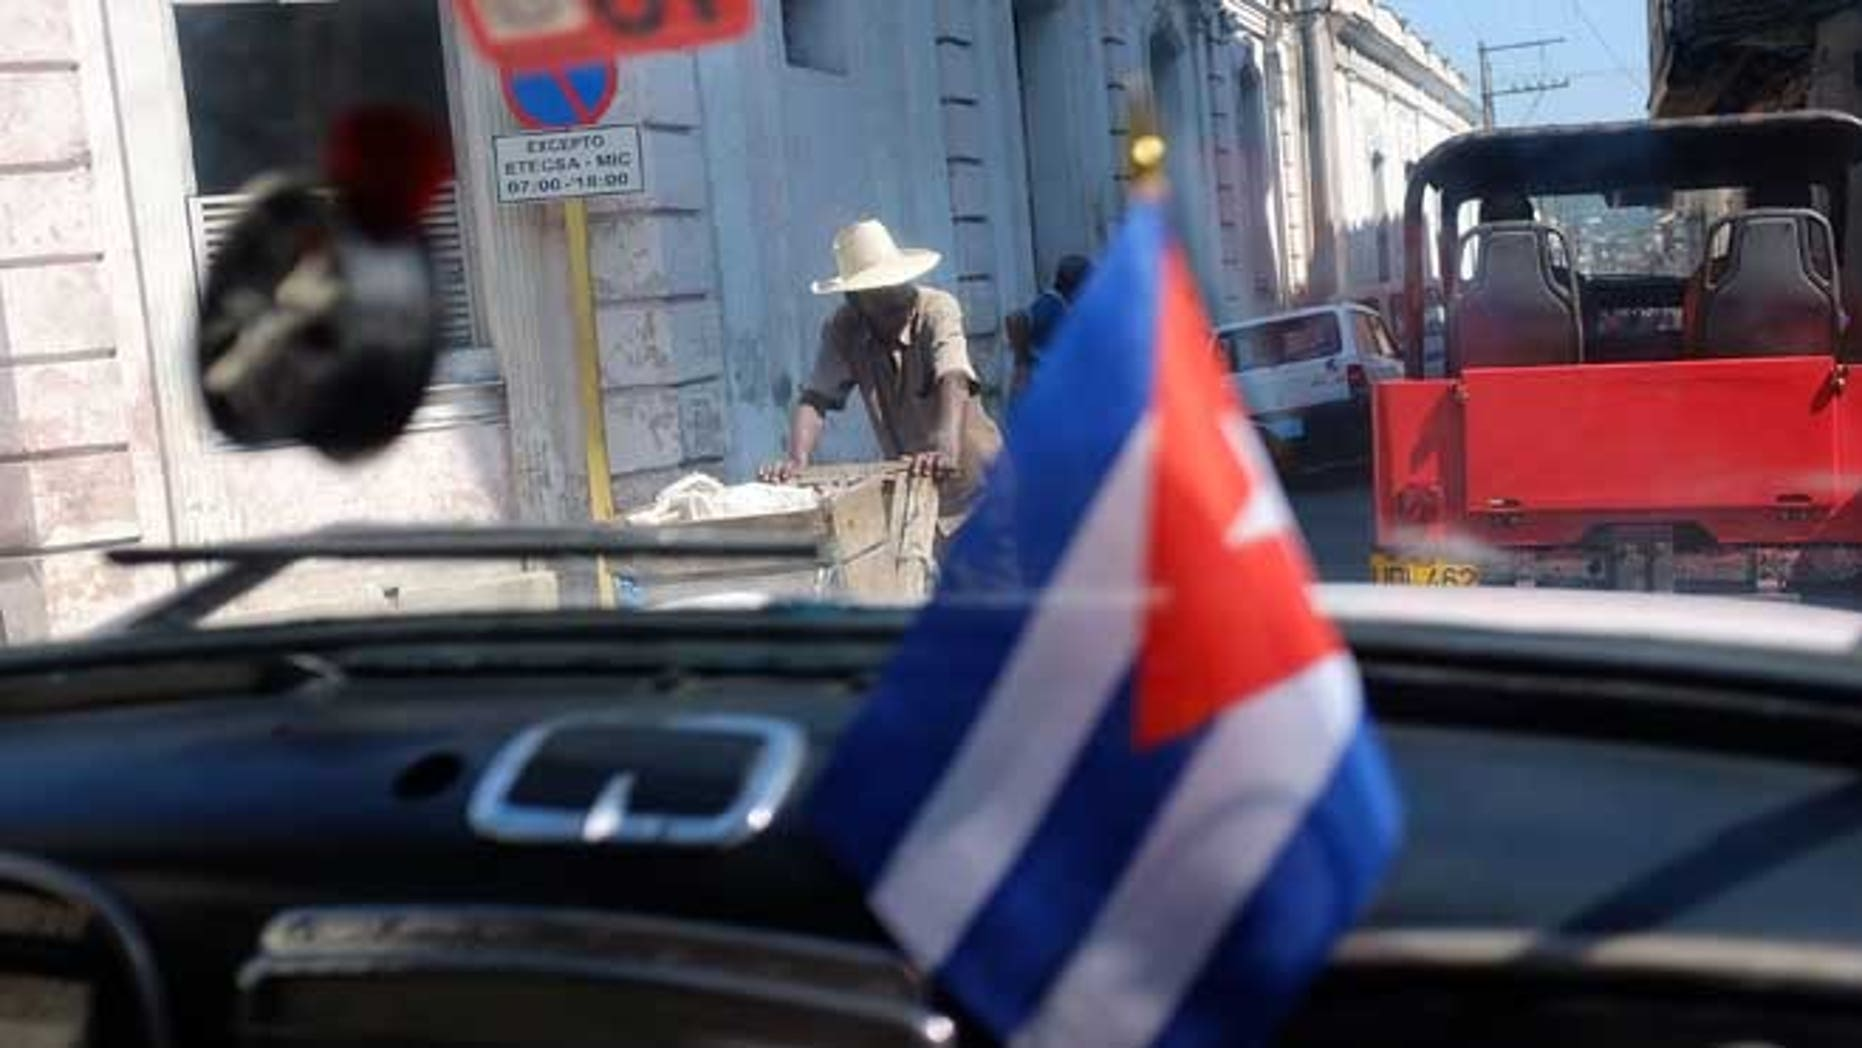 Santiago de Cuba.(Photo by Spencer Platt/Getty Images)